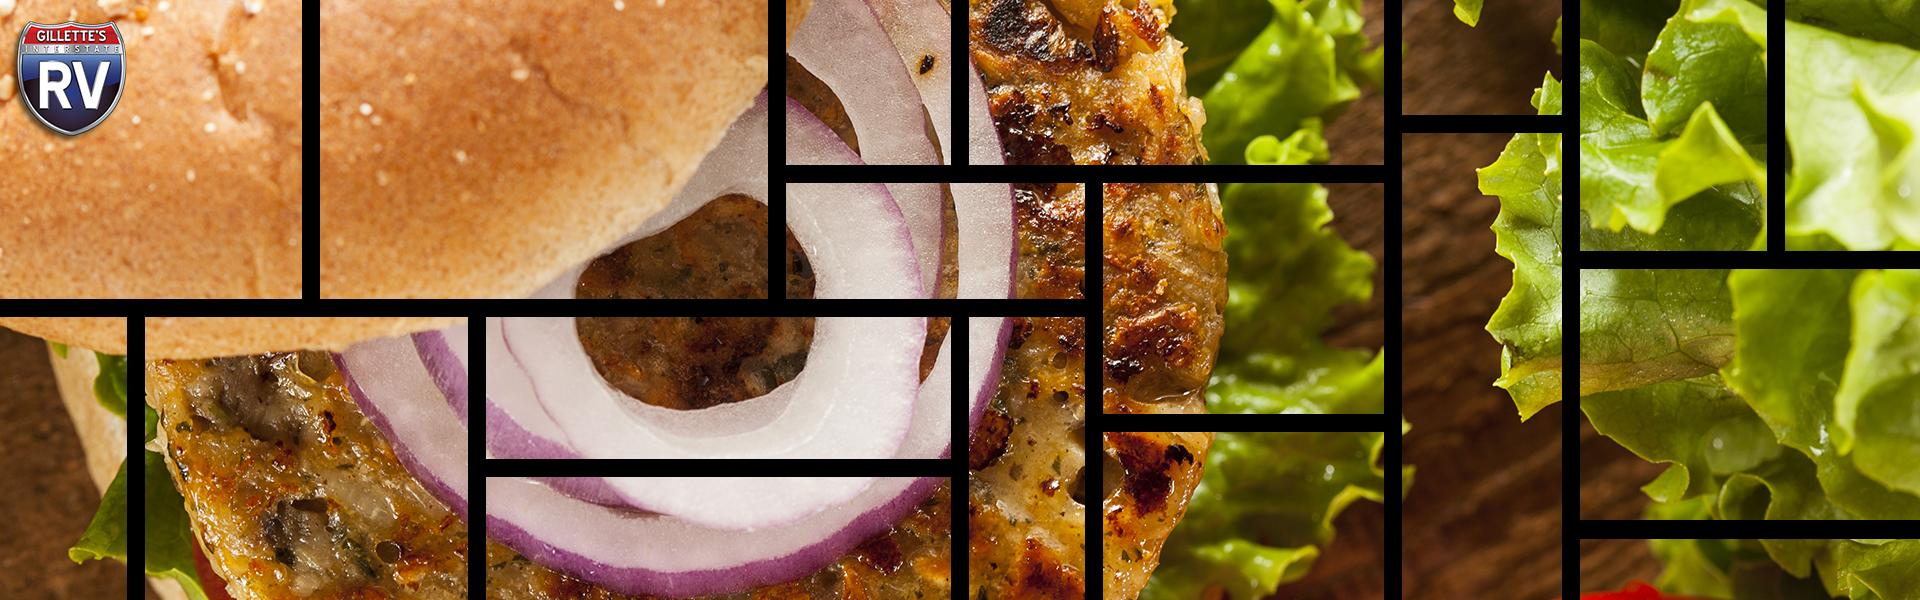 Black bean burger in a grid format.